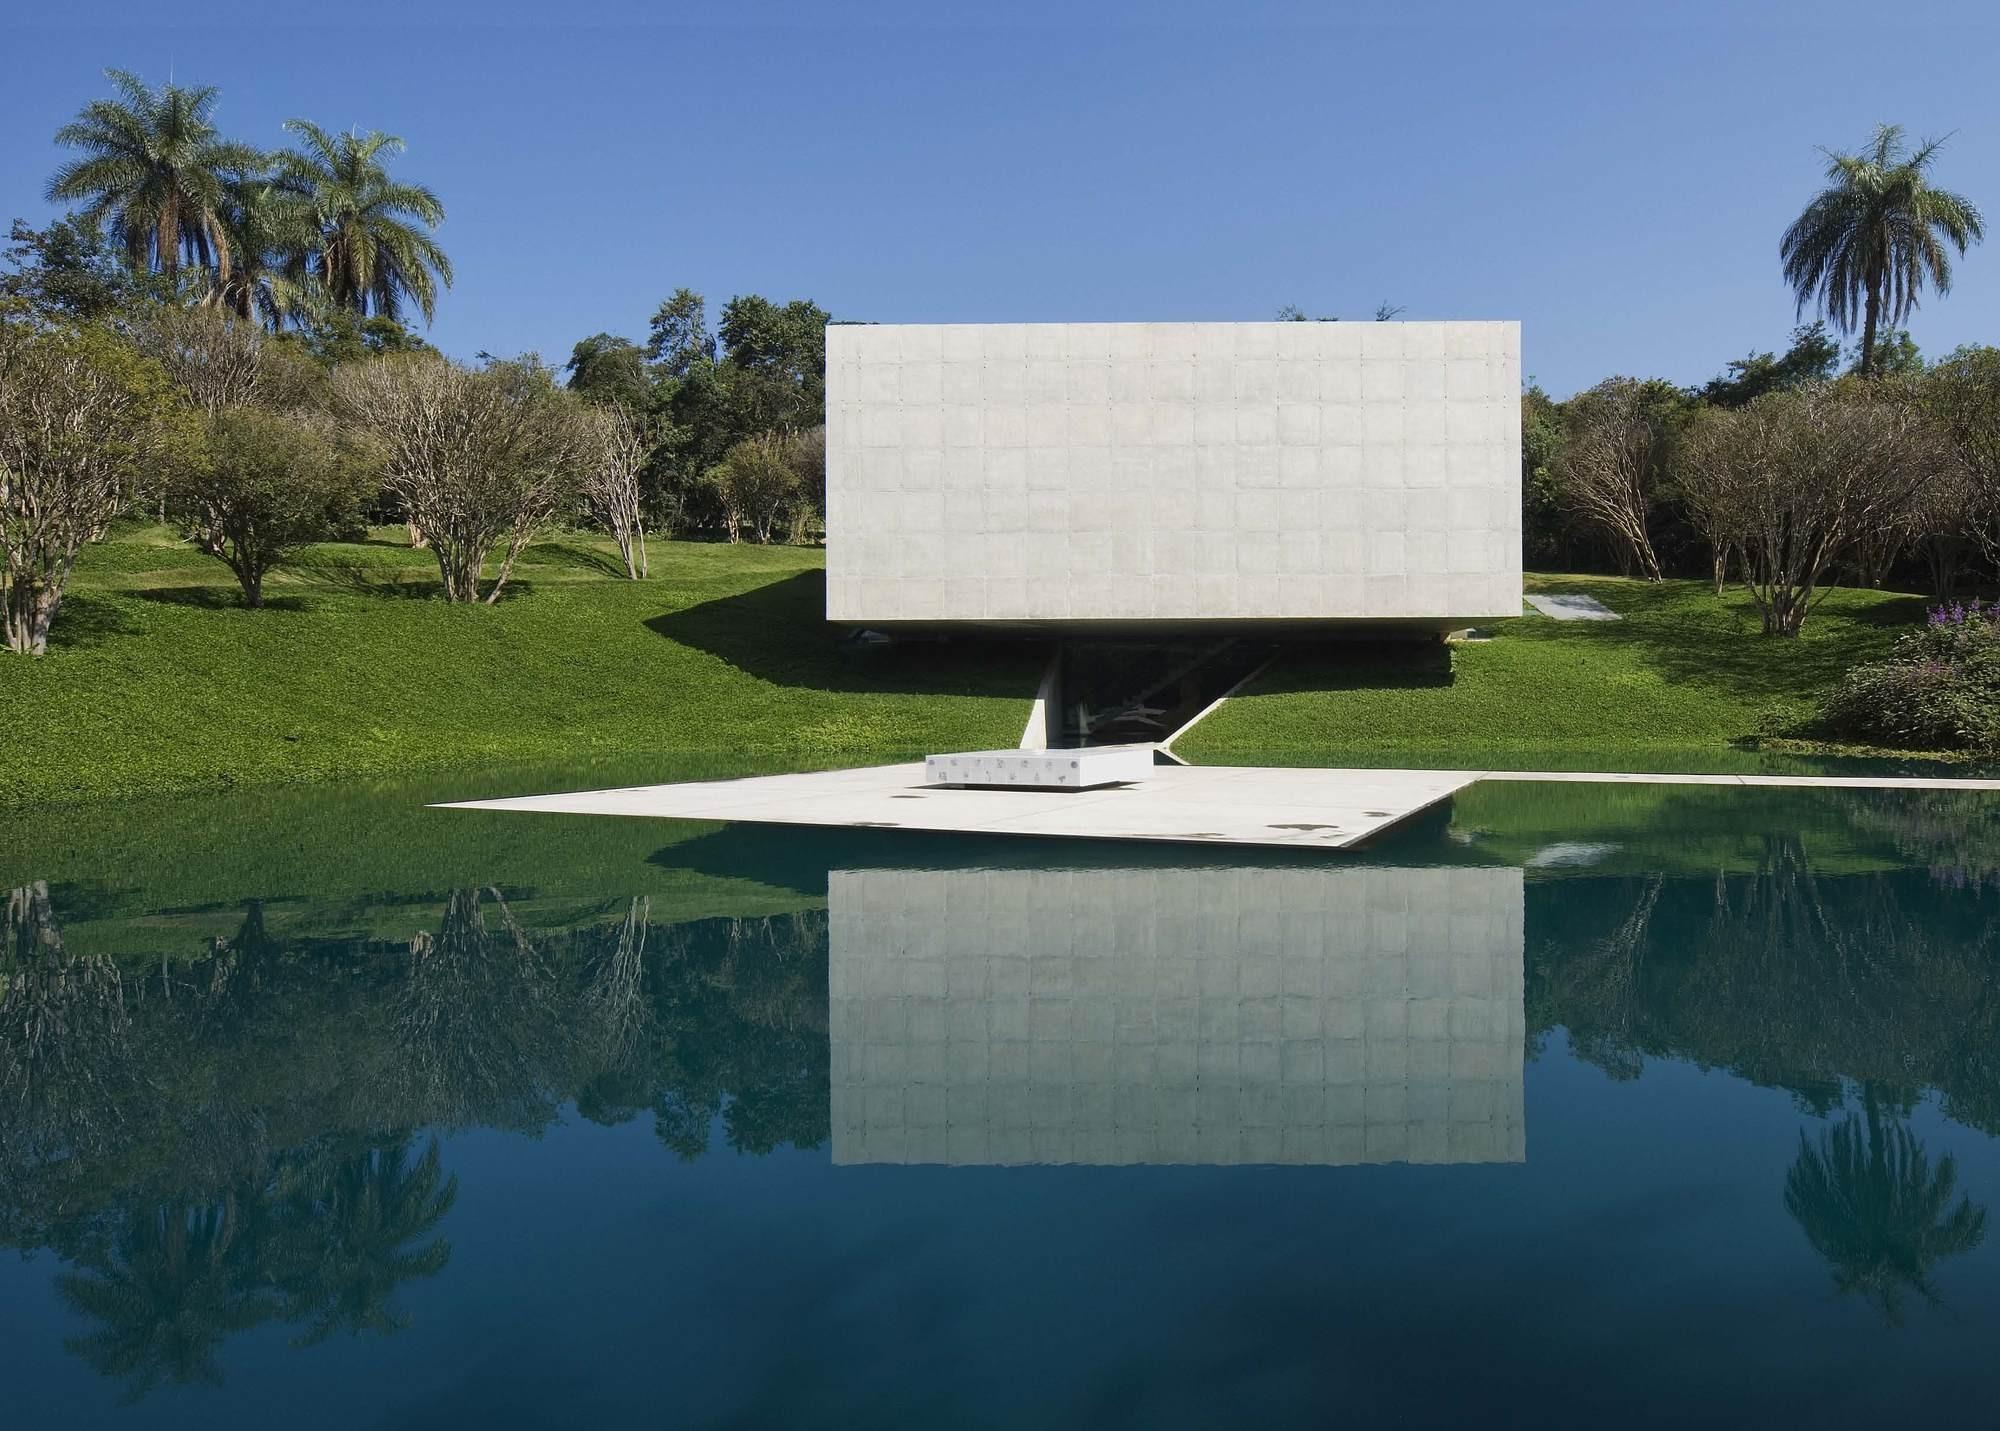 AD Round Up: Architecture in Brazil II, Adriana Varejão Gallery / Tacoa Arquitetos. Image © Eduardo Eckenfels